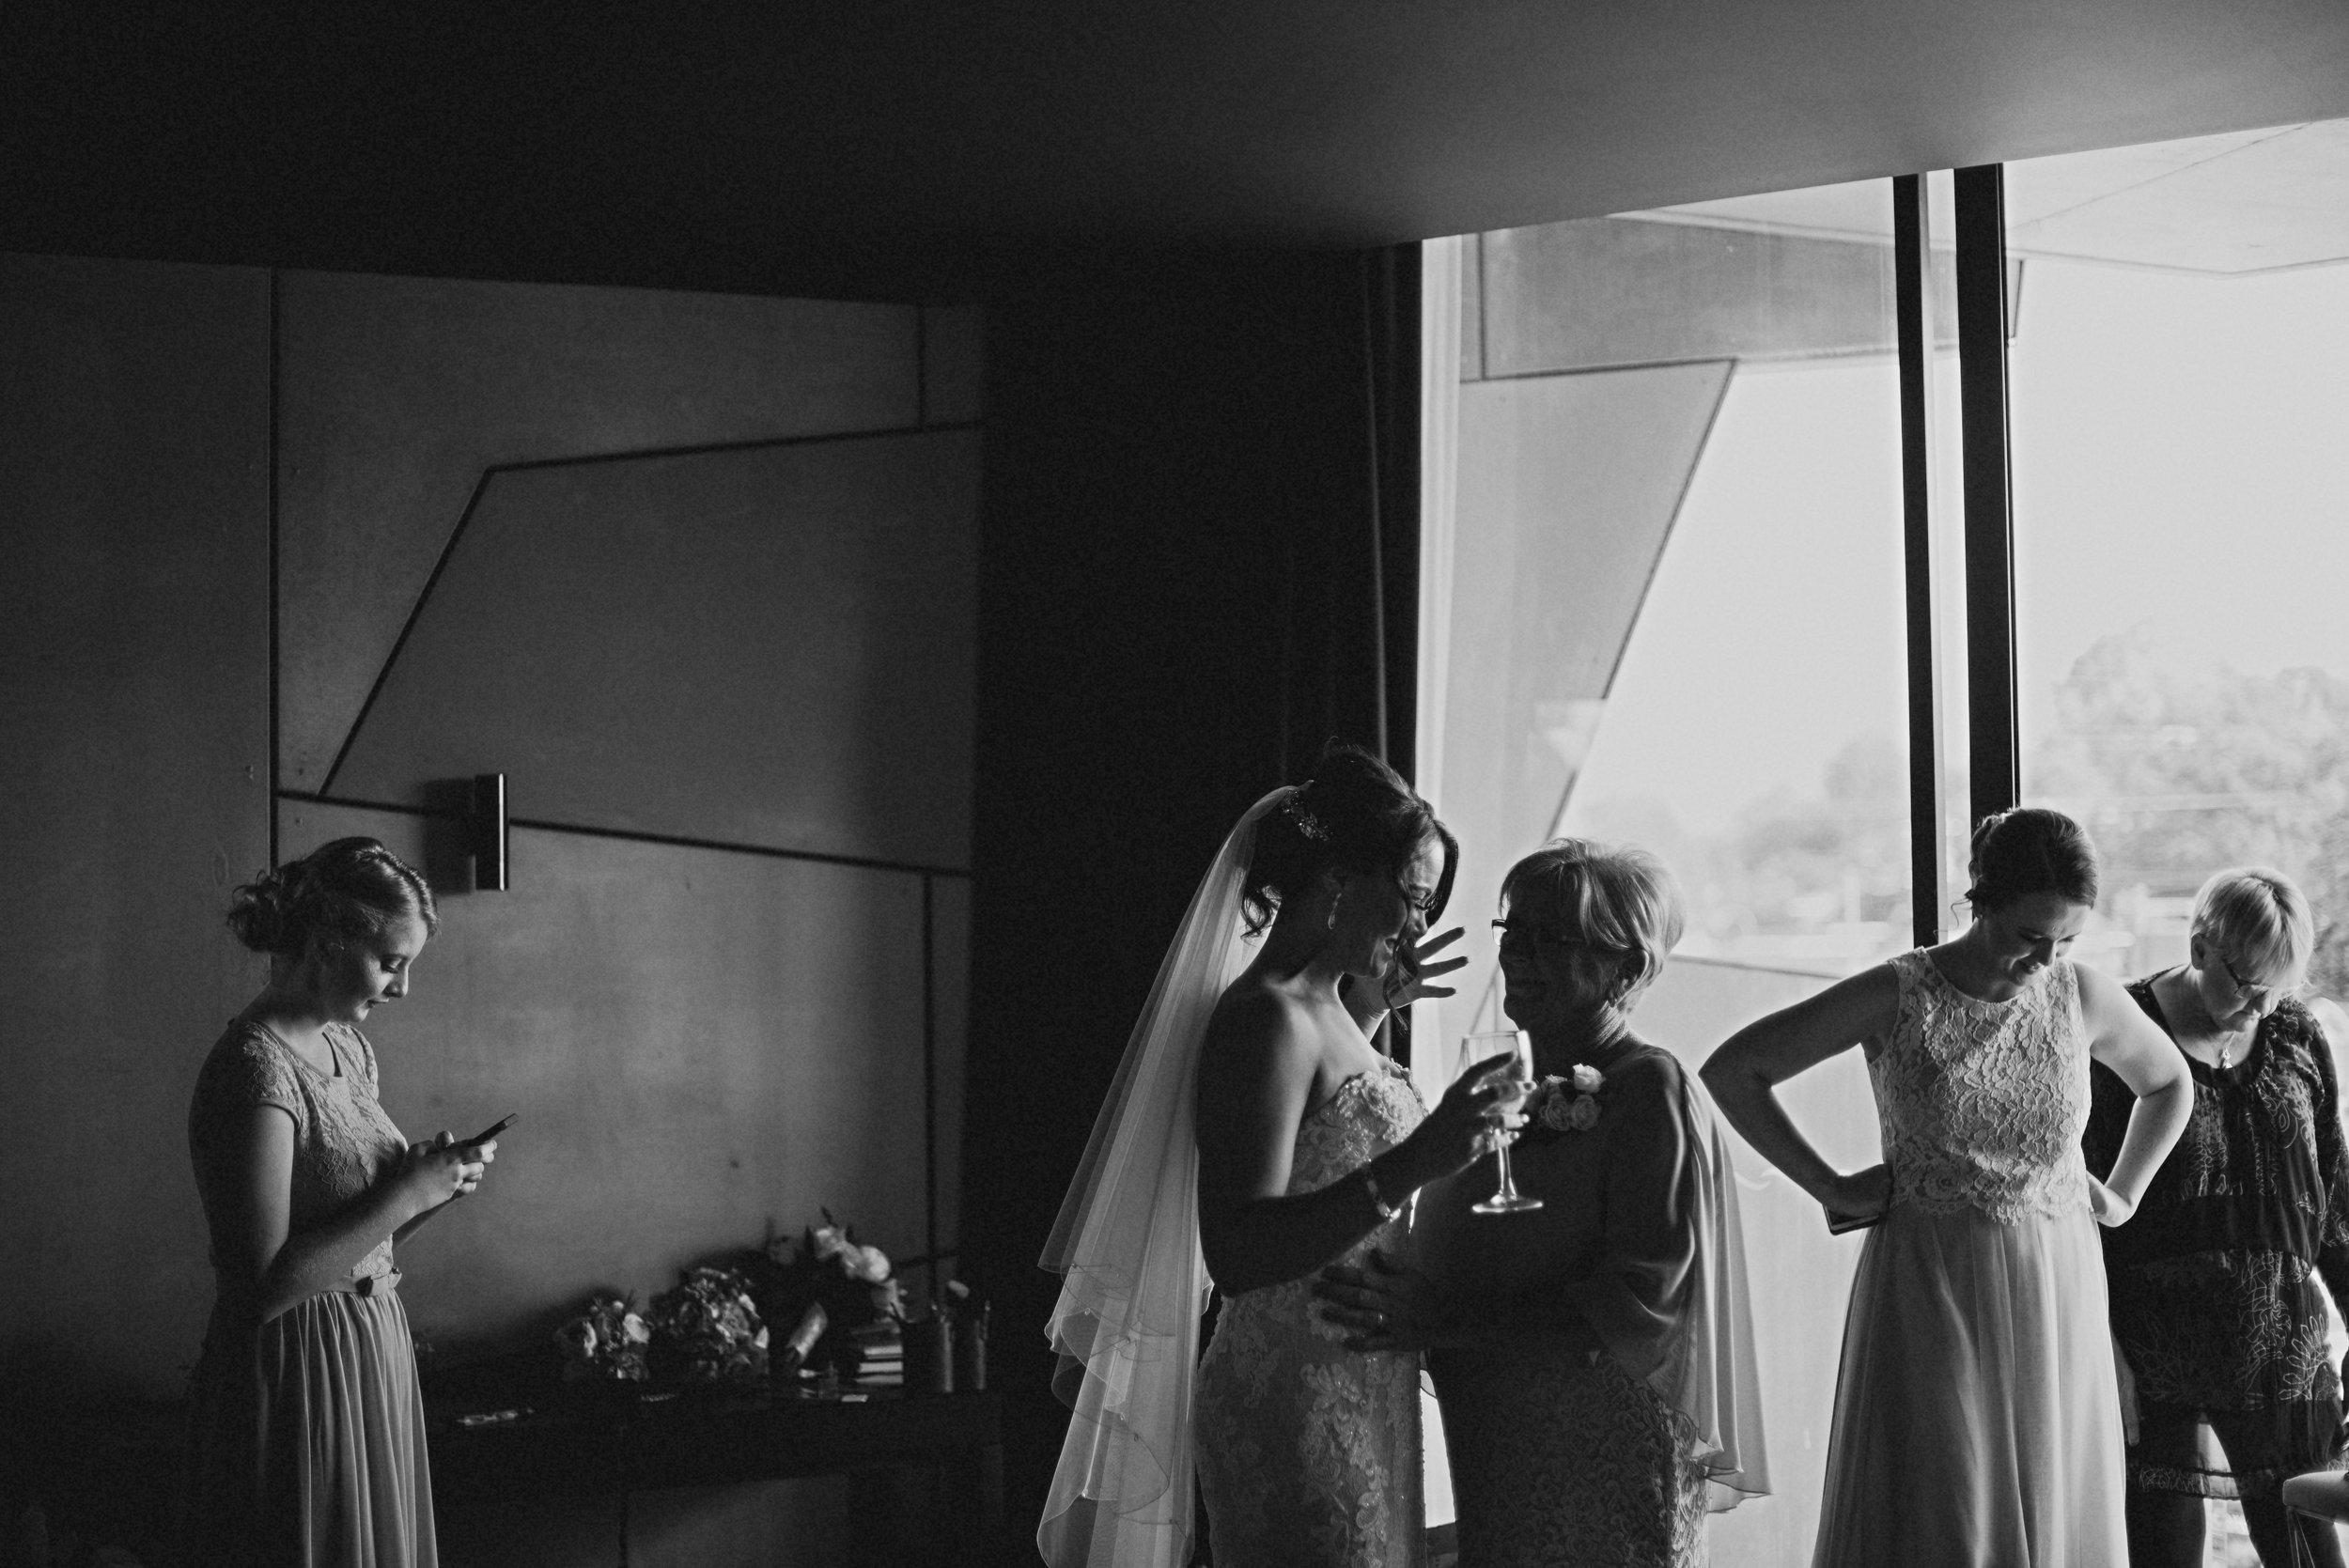 20180613_Destiny_Steve_Wedding-108-Edit-2.jpg